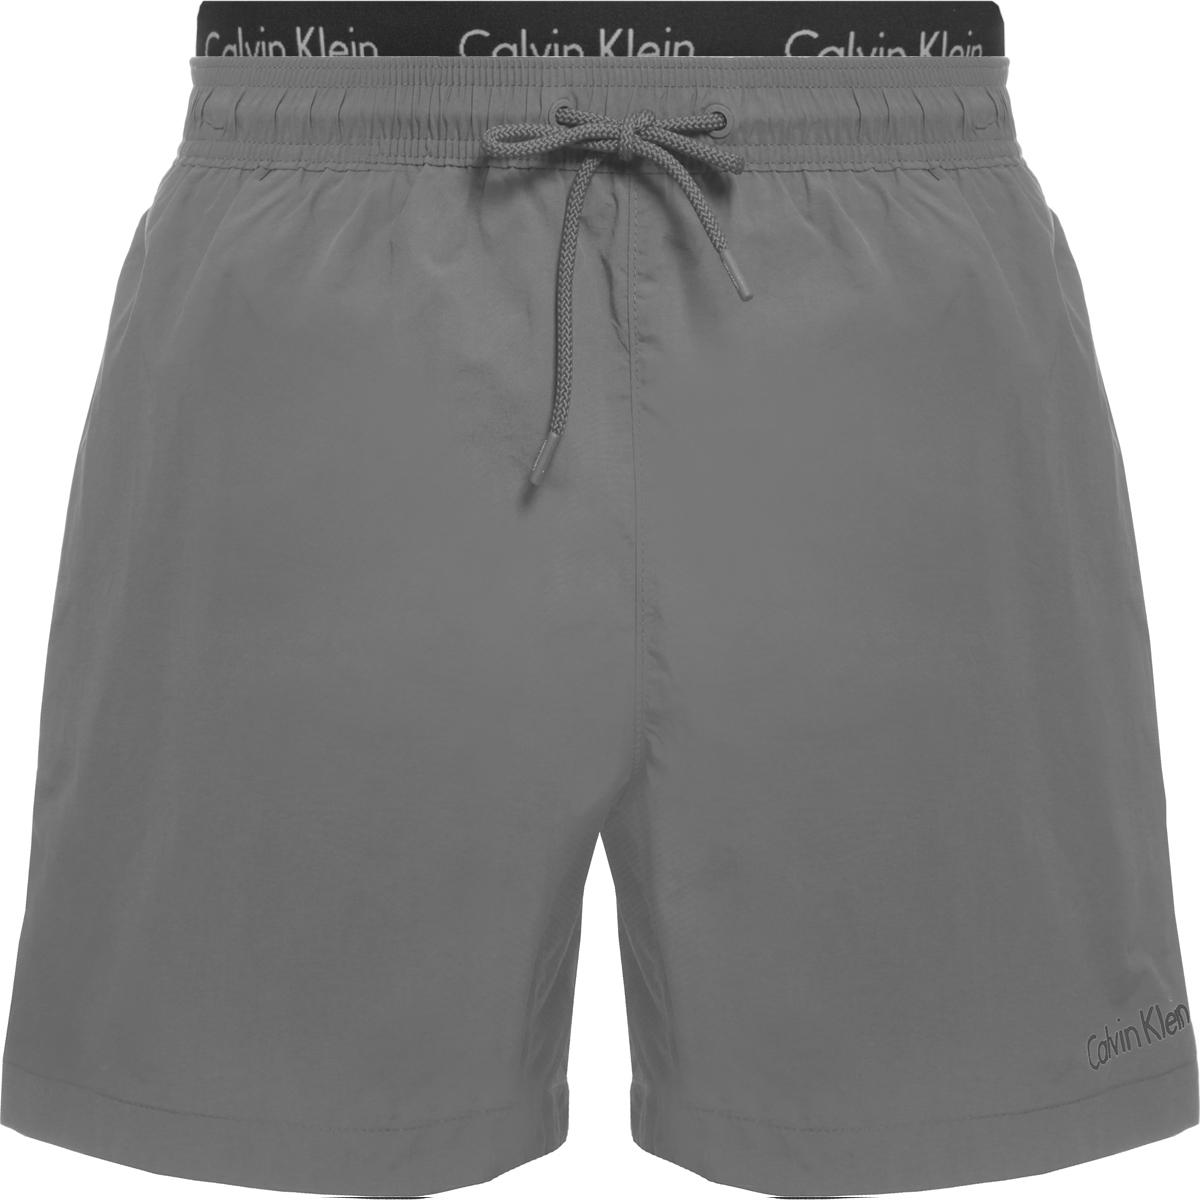 Шорты купальные мужские Calvin Klein Underwear, цвет: серый. KM0KM00167. Размер XL (52)